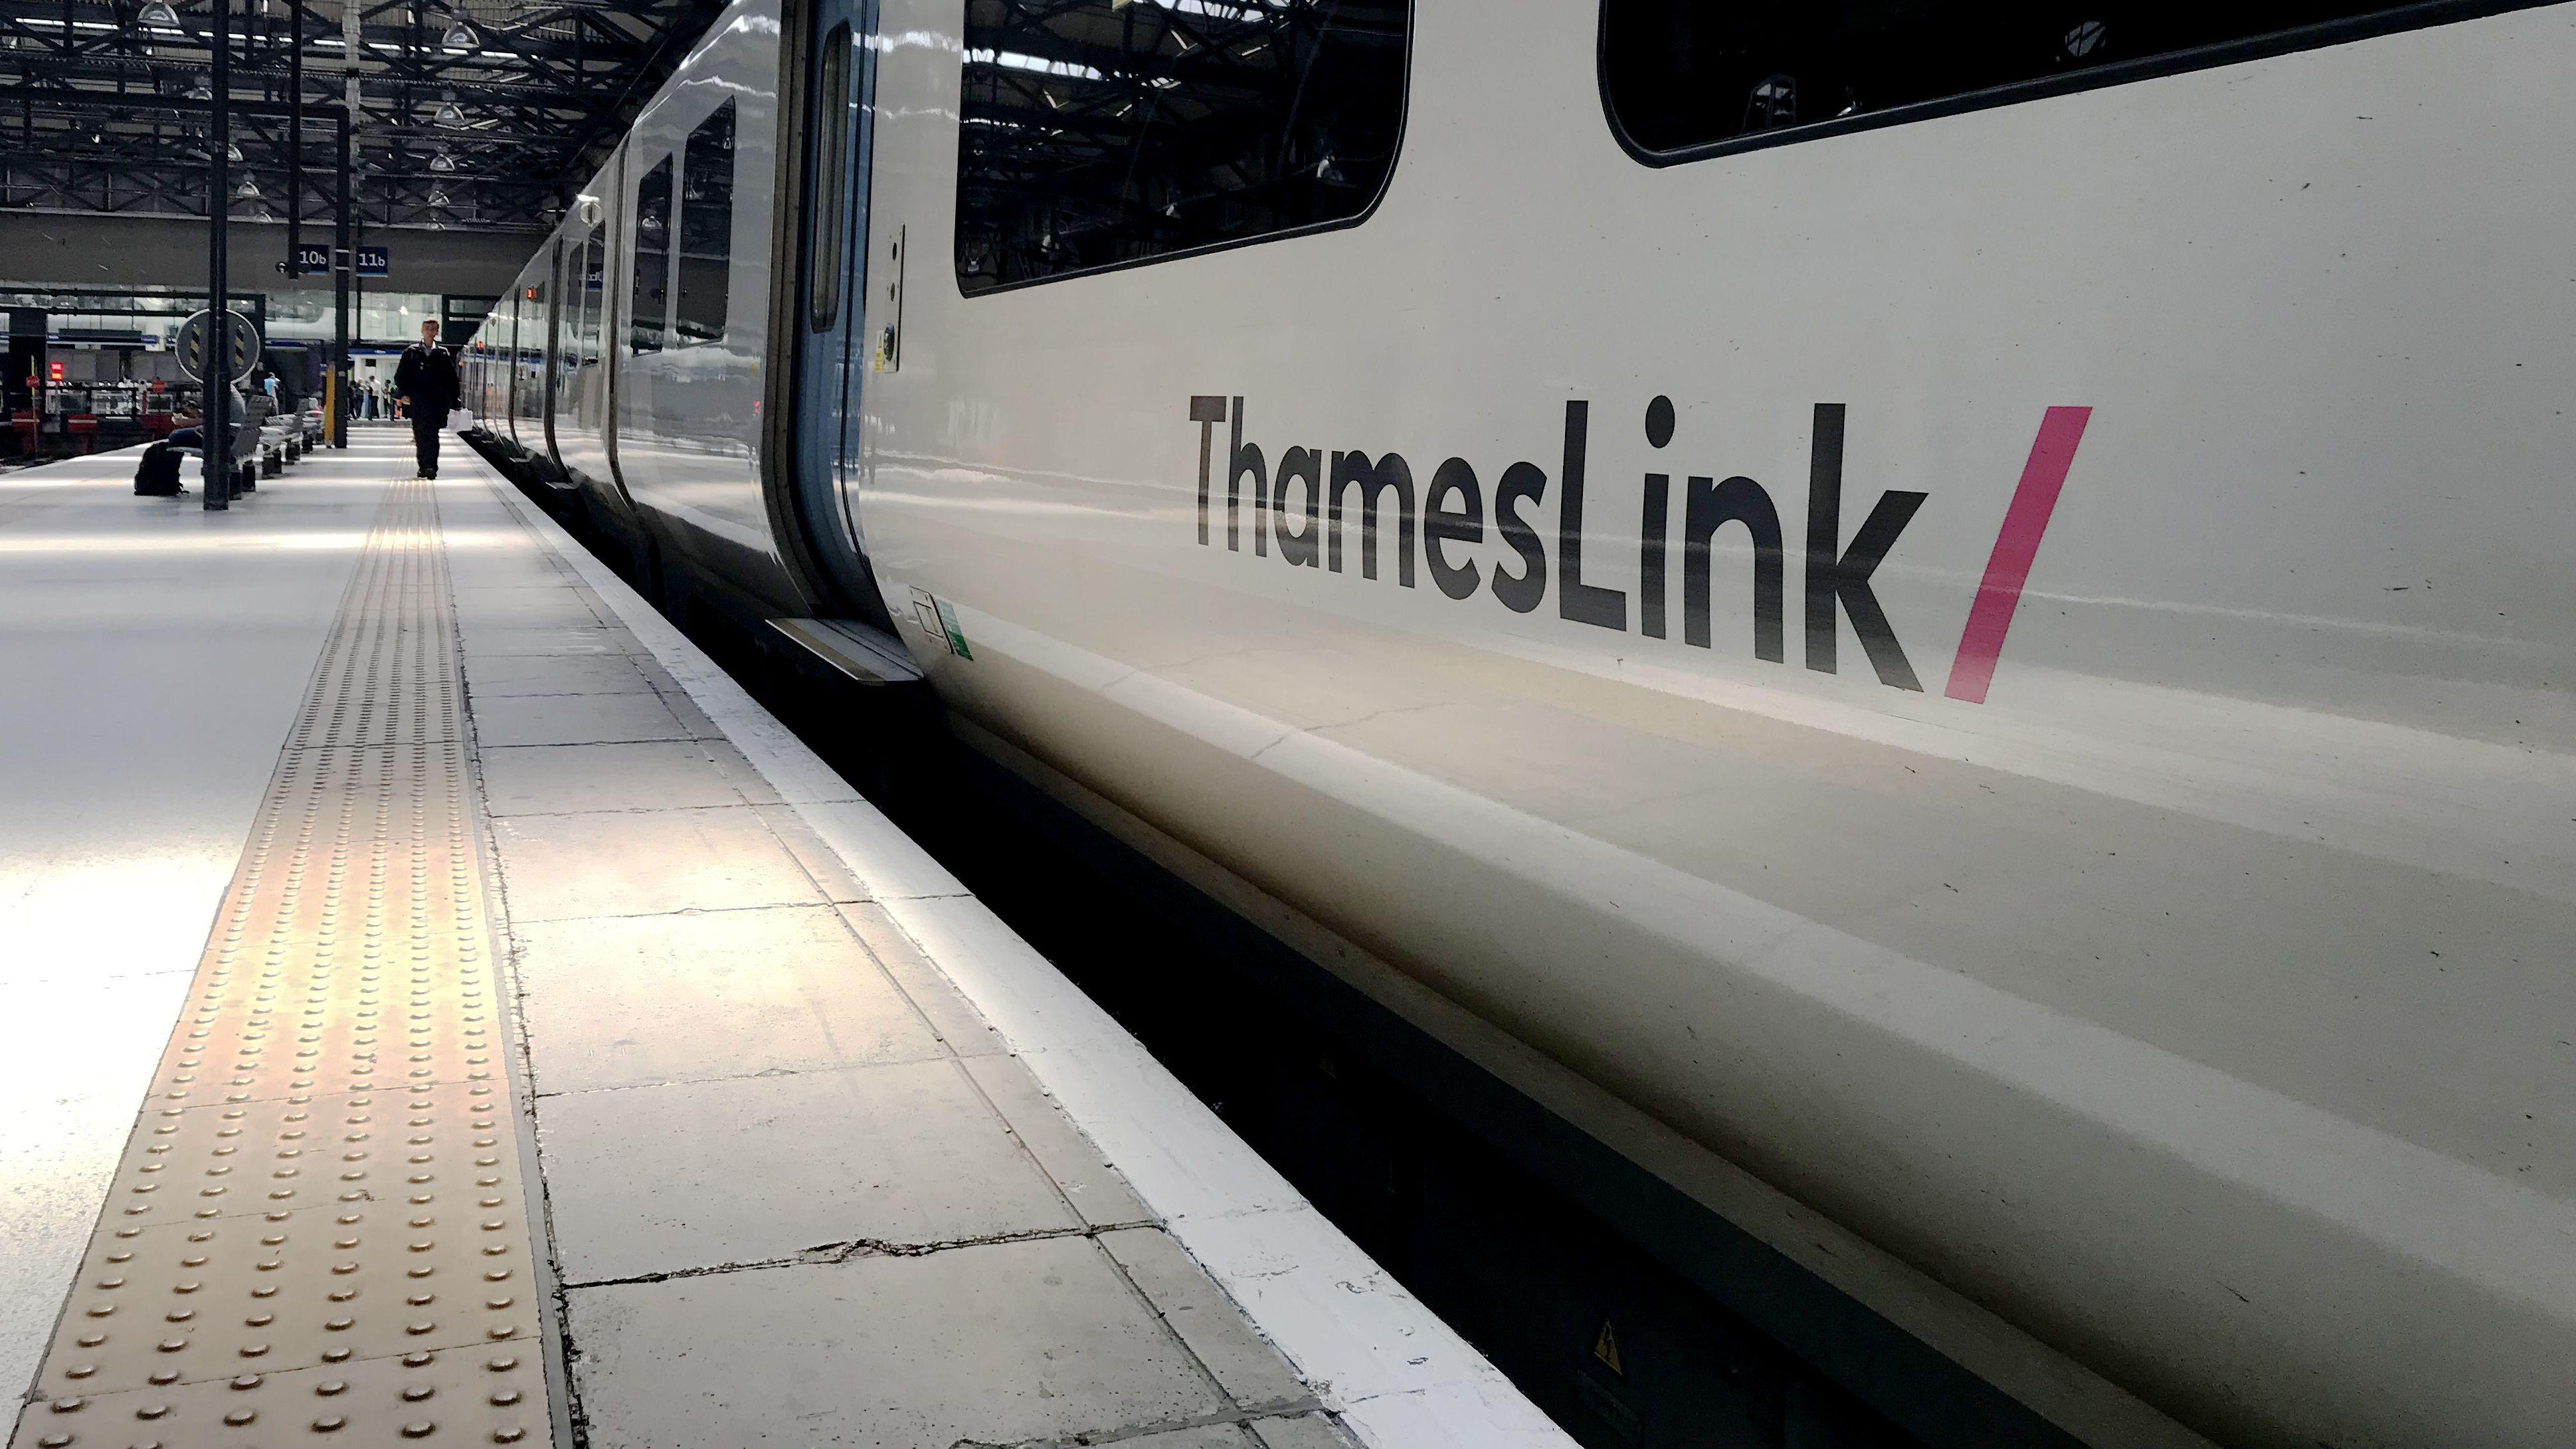 Zug der Eisenbahngesellschaft ThamesLink an Bahnhof Kings Cross in London